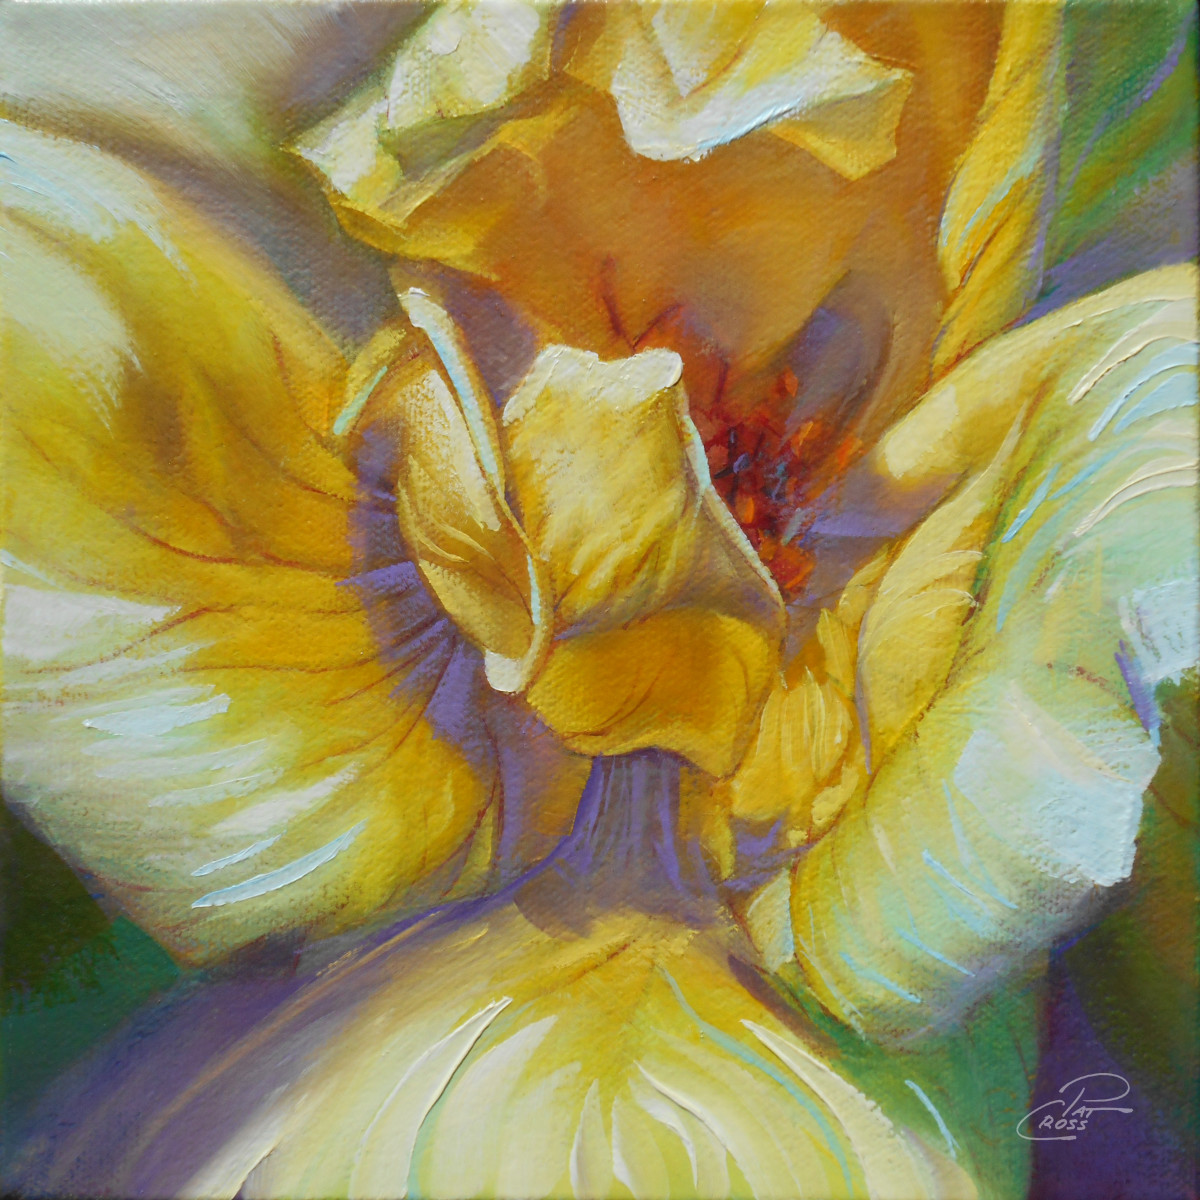 Golden Delight by Pat Cross